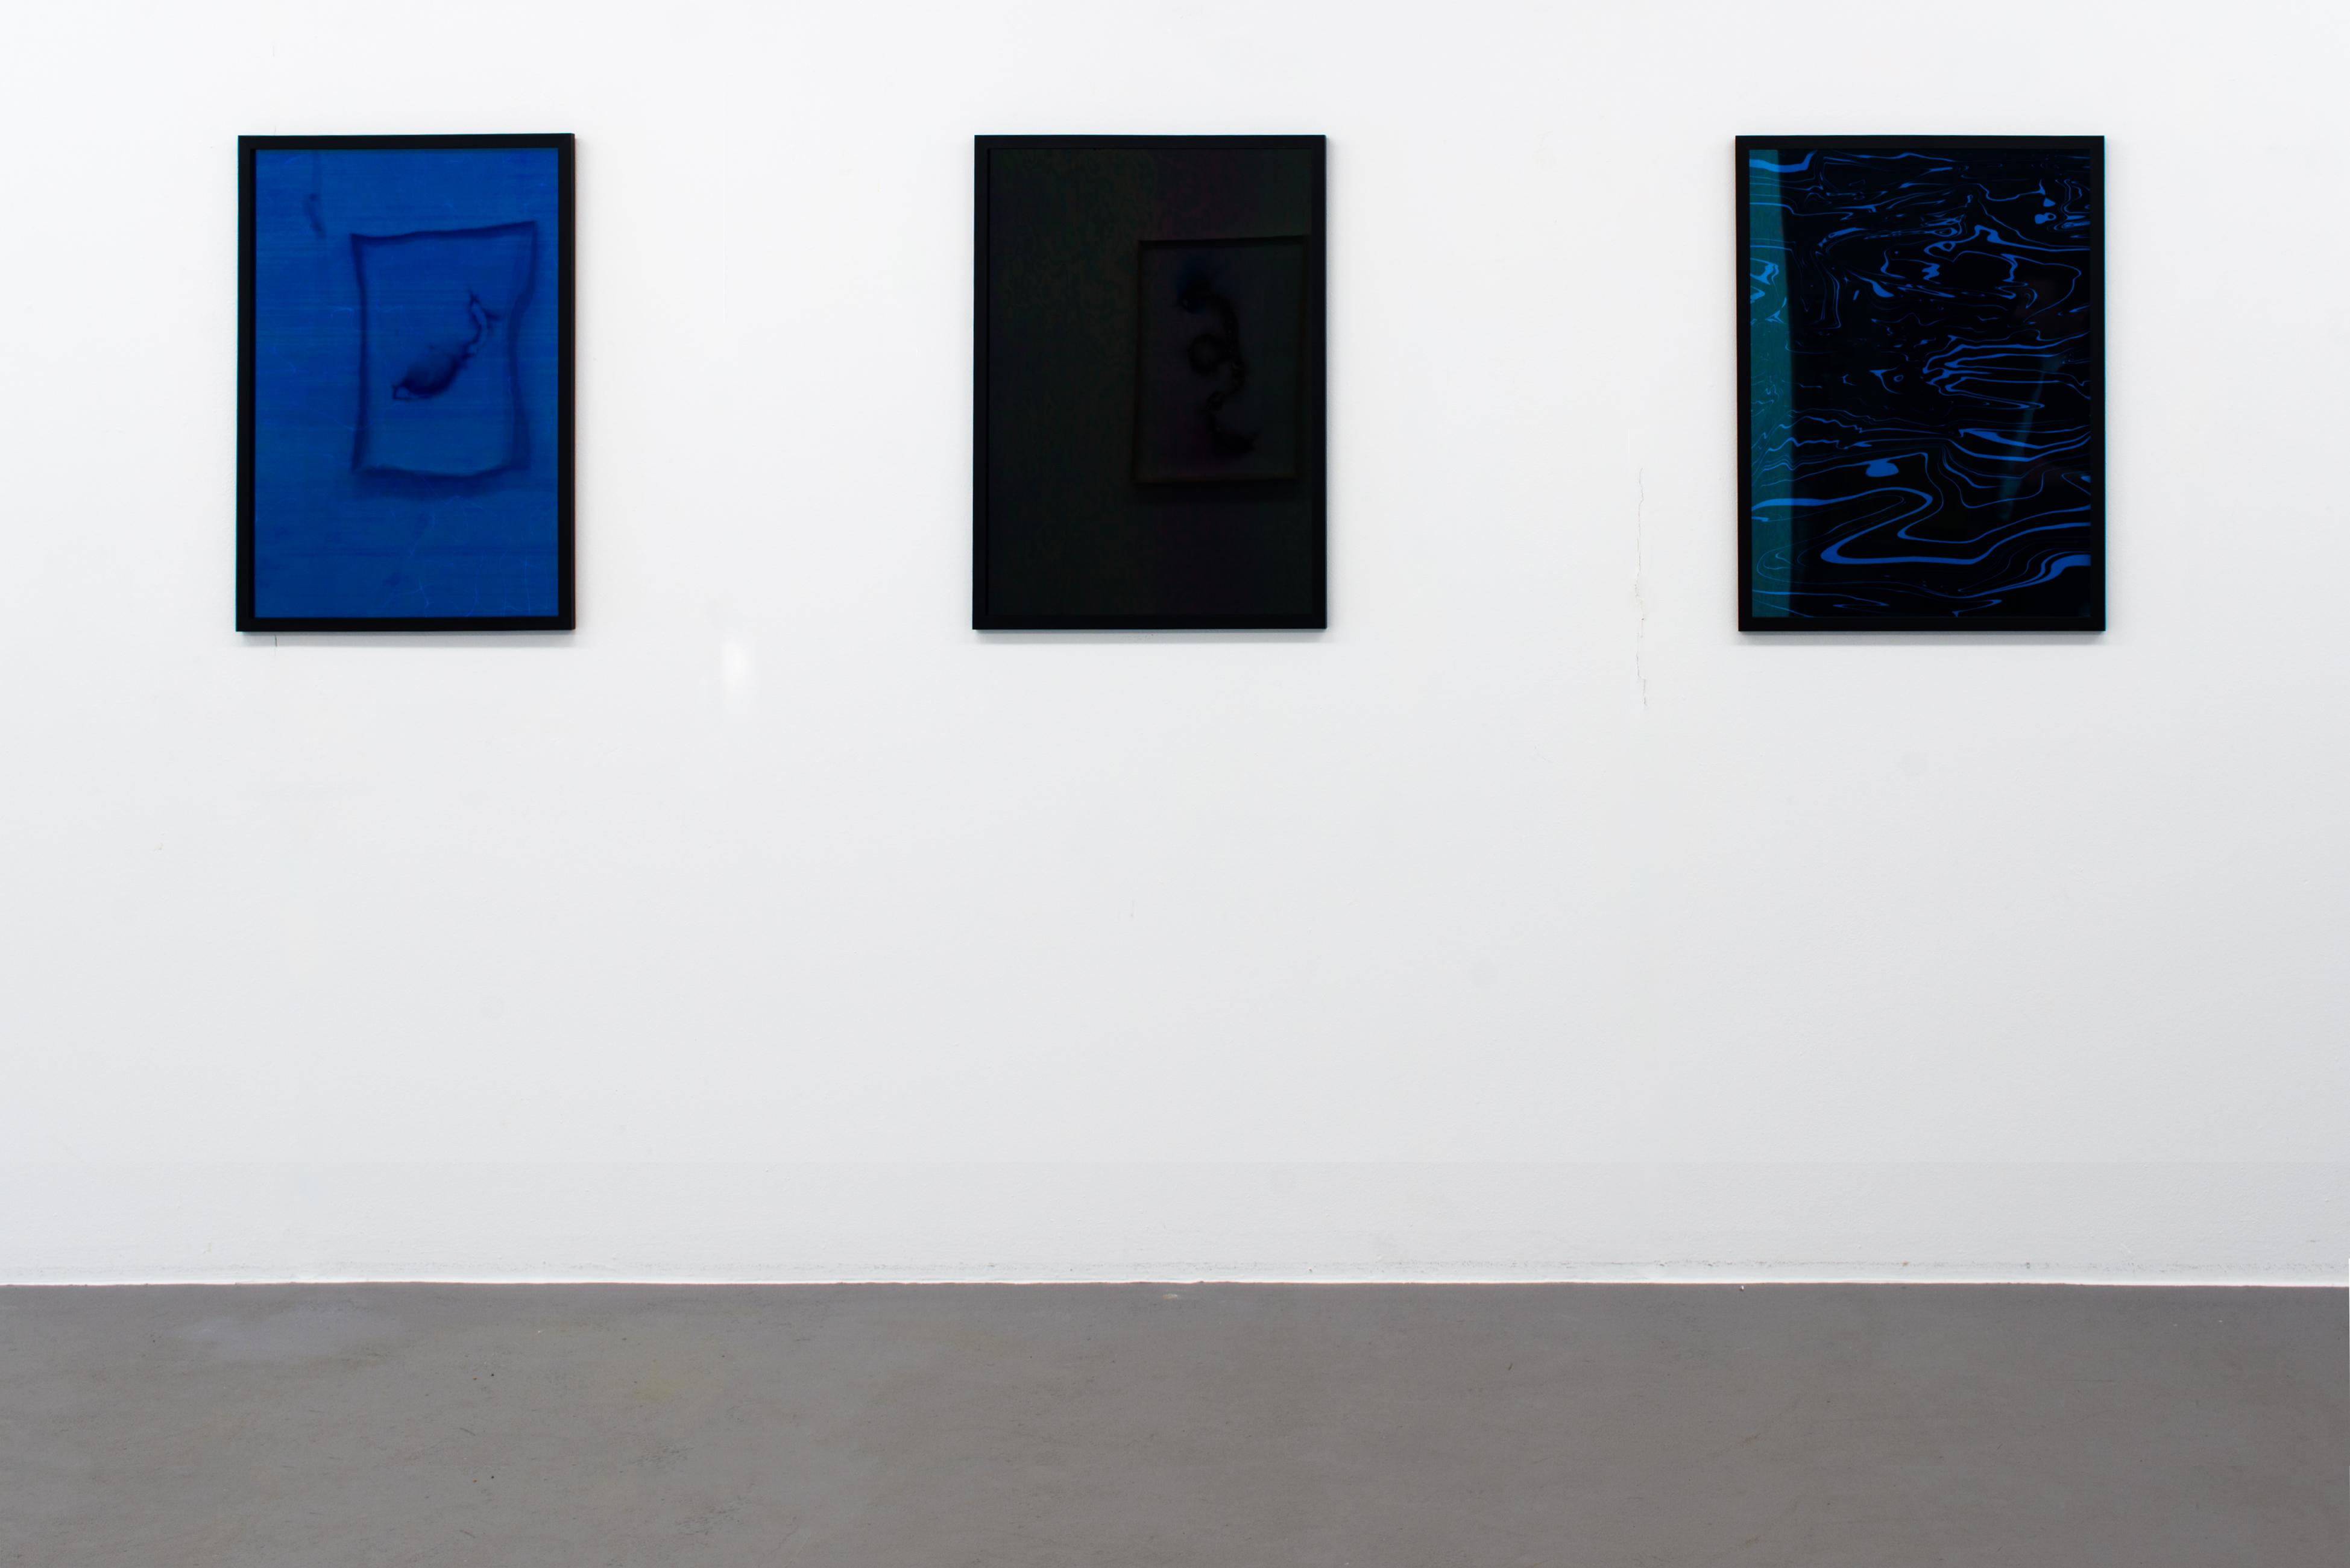 Blue Sapphire, Black, Electric Blue